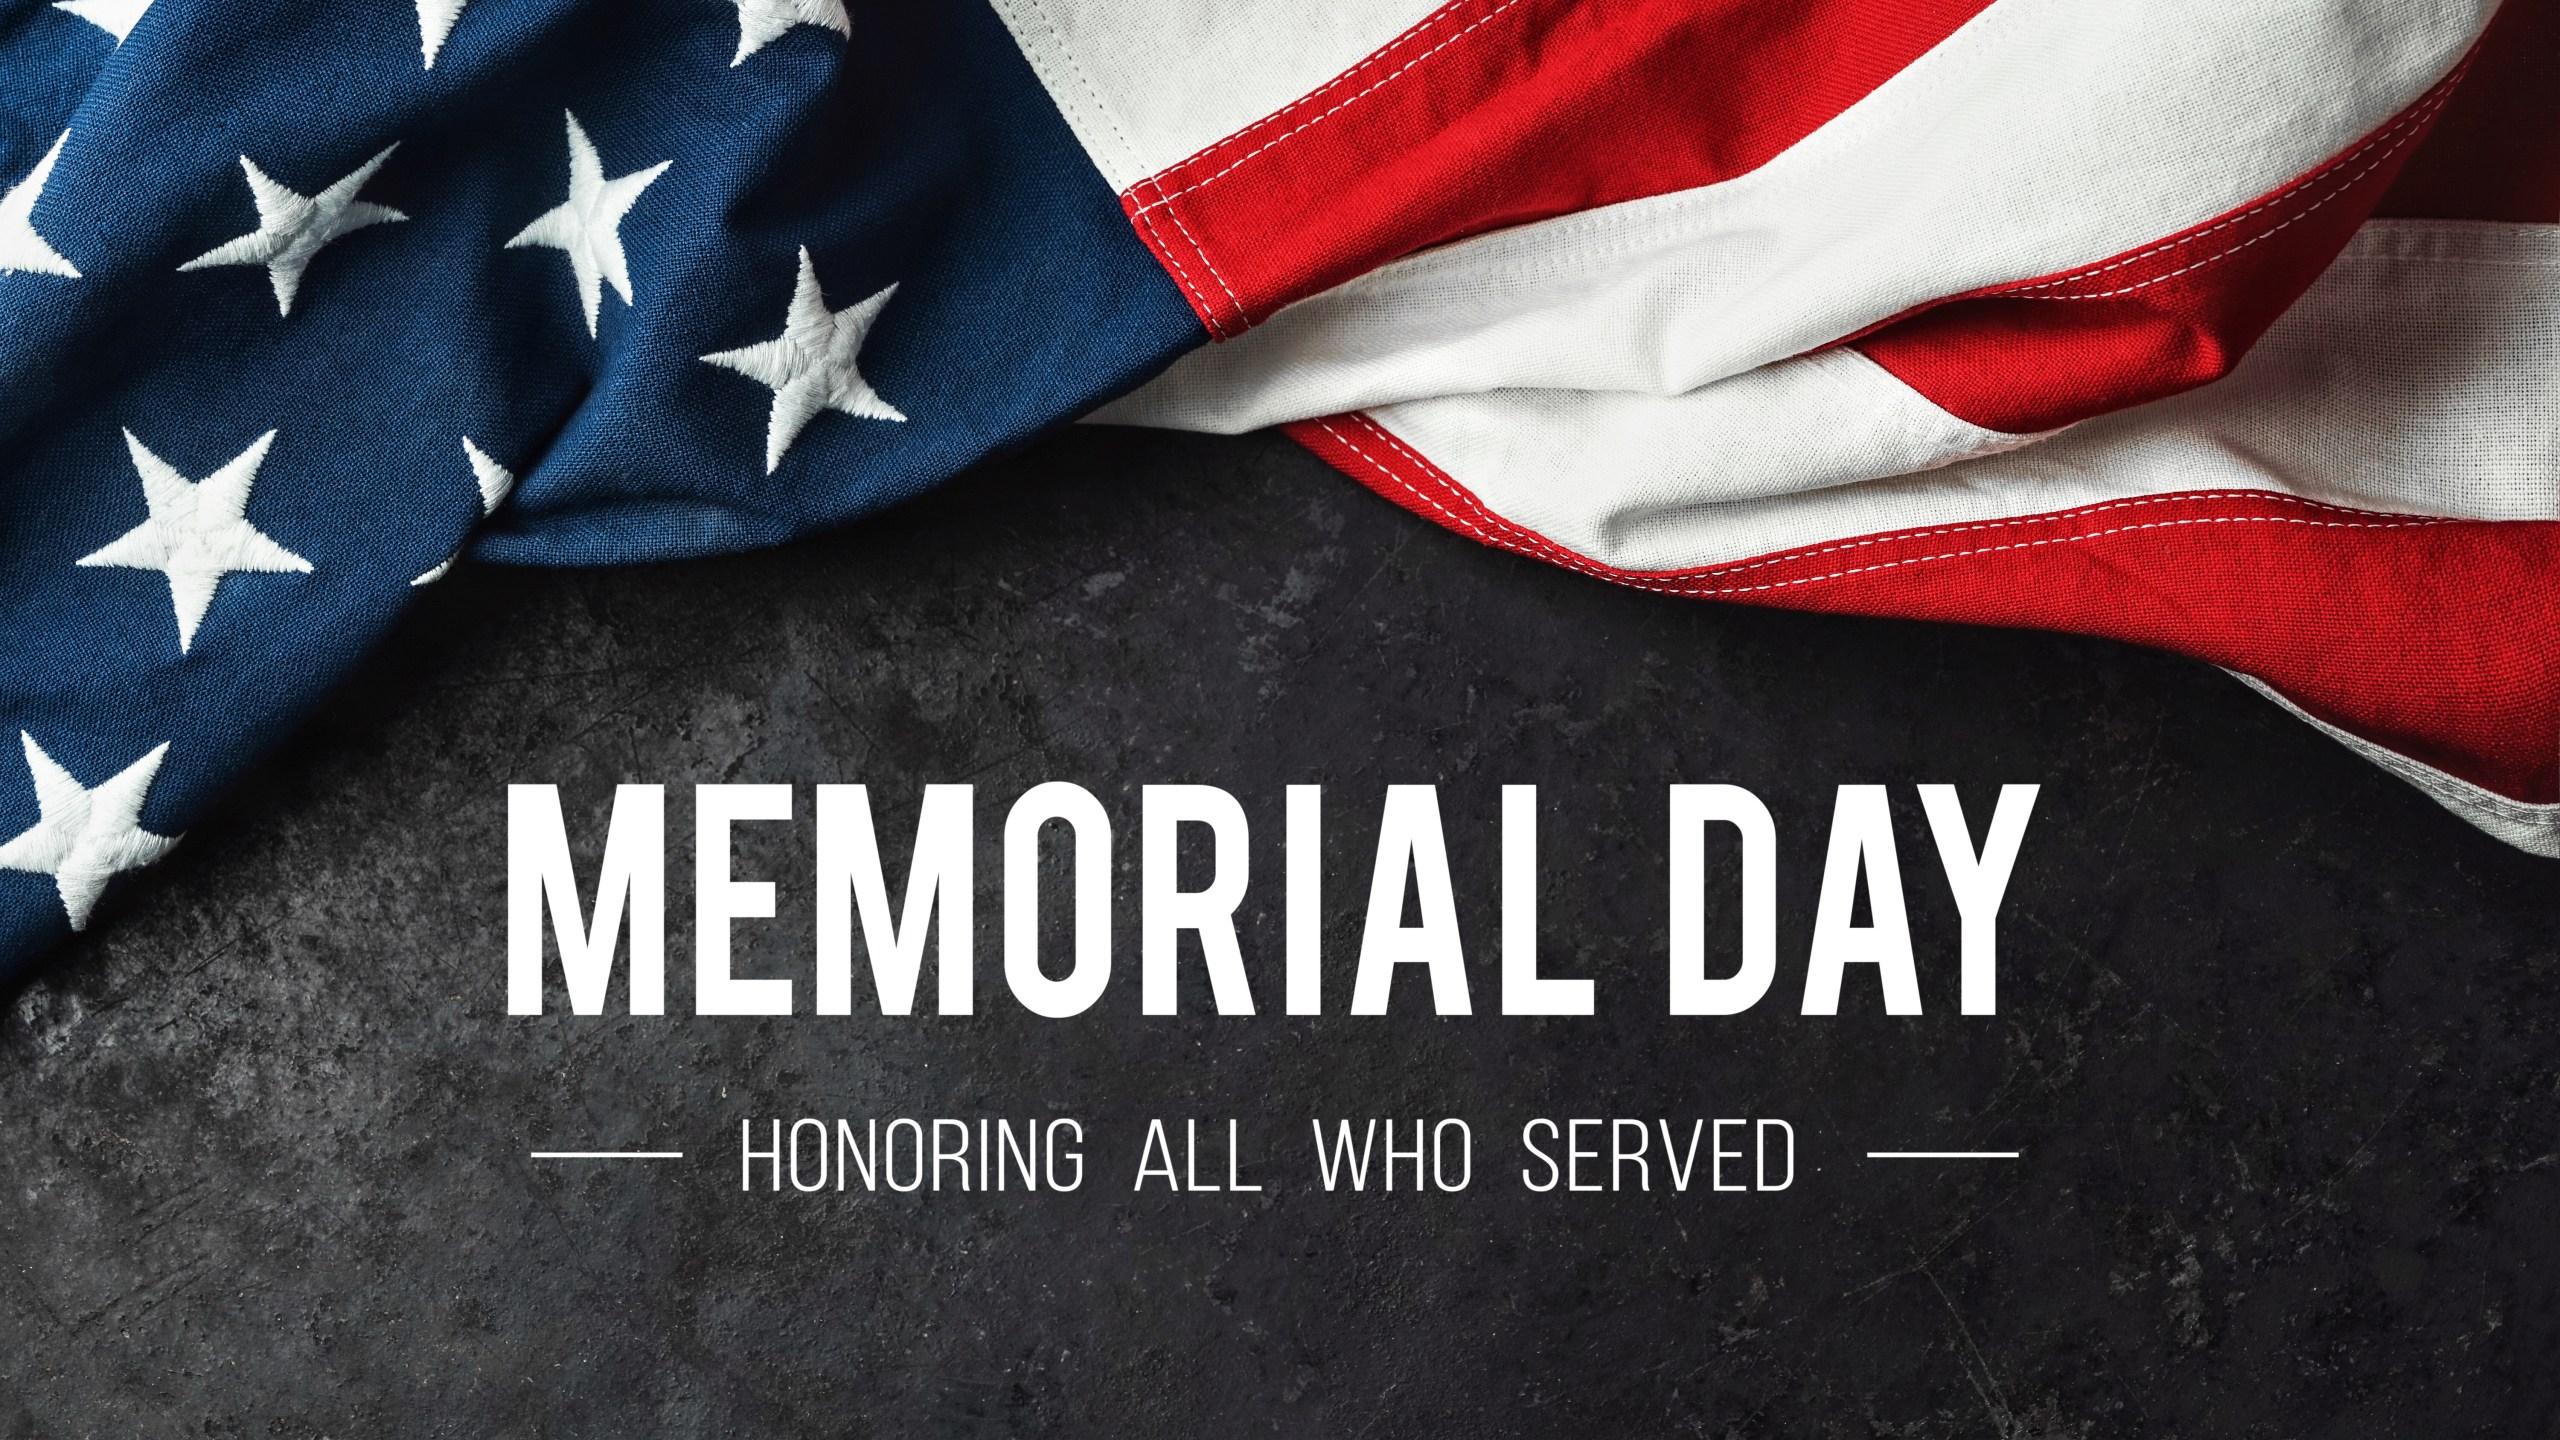 Ohio Valley Memorial Day Services